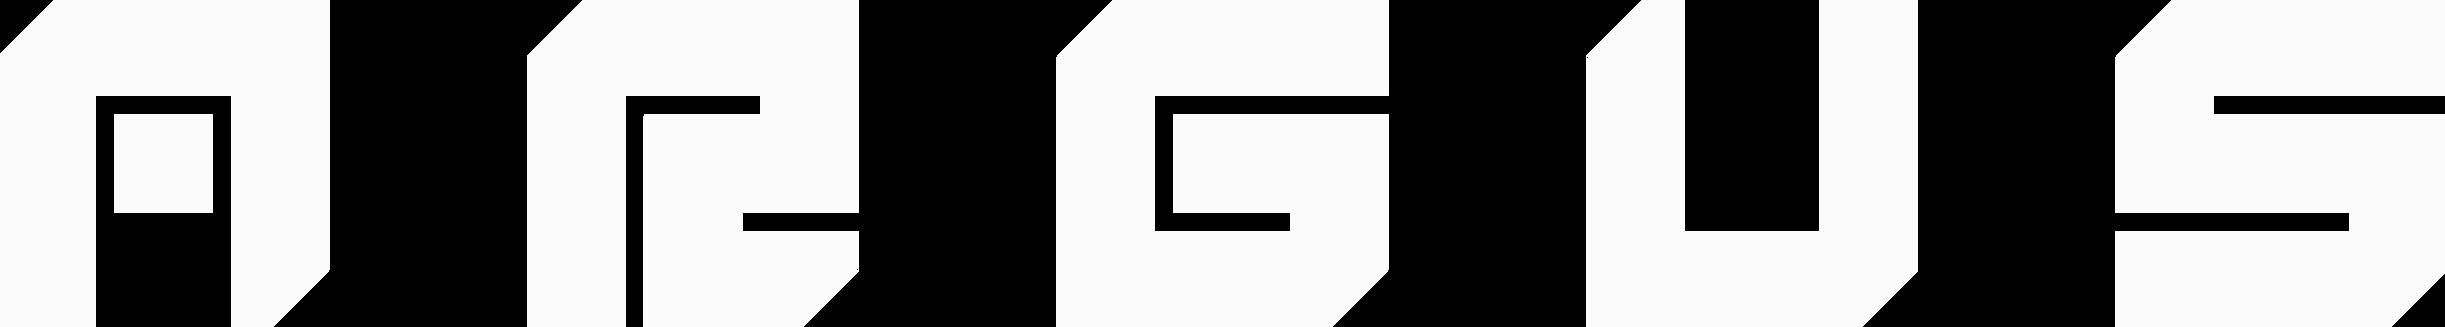 Sao anime symbol view symbol biocorpaavc